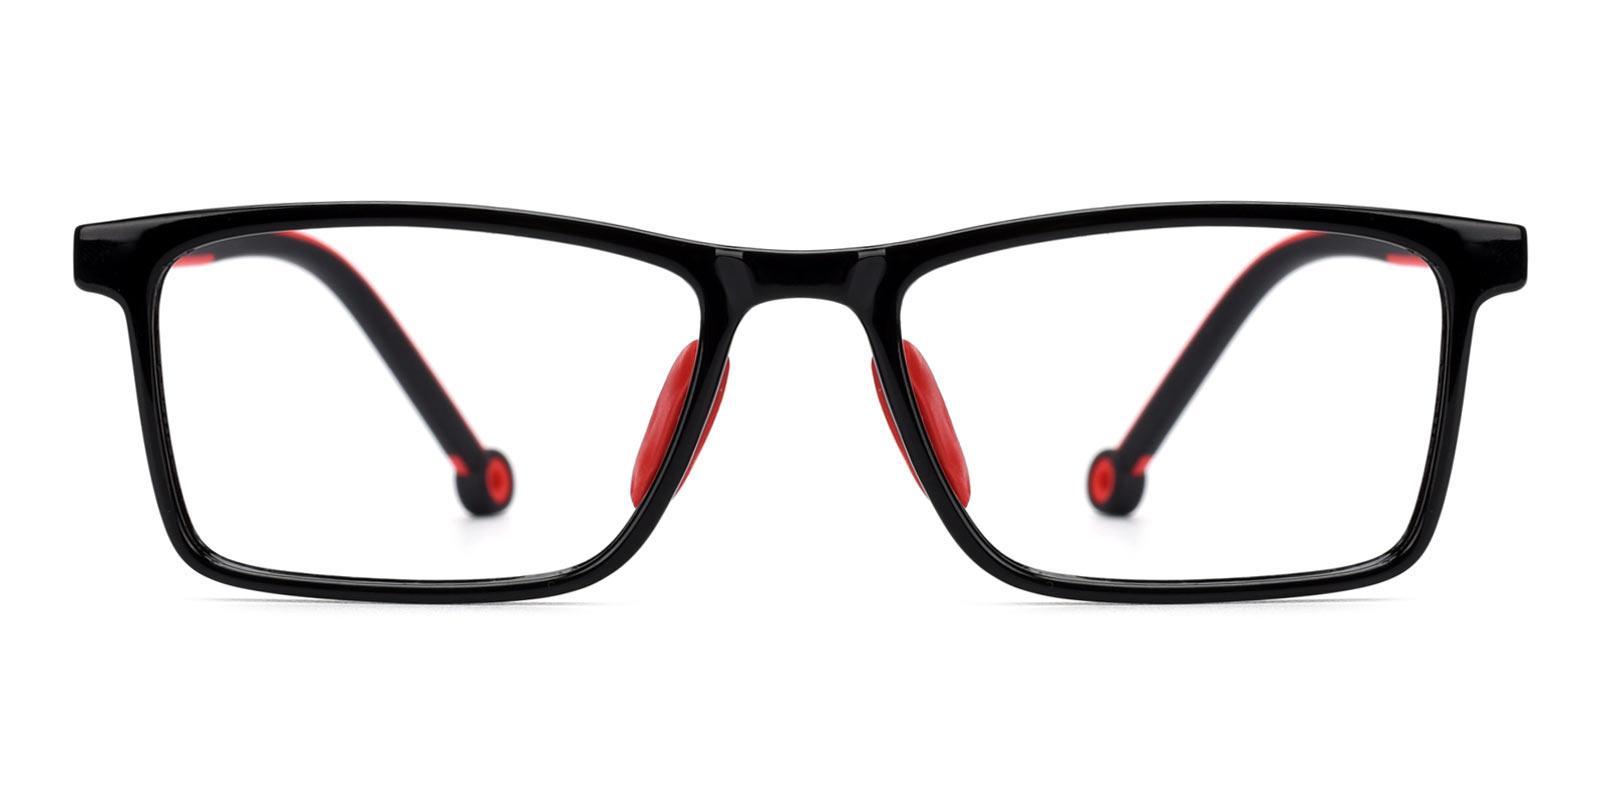 Lance-Red-Rectangle-Plastic-Eyeglasses-detail